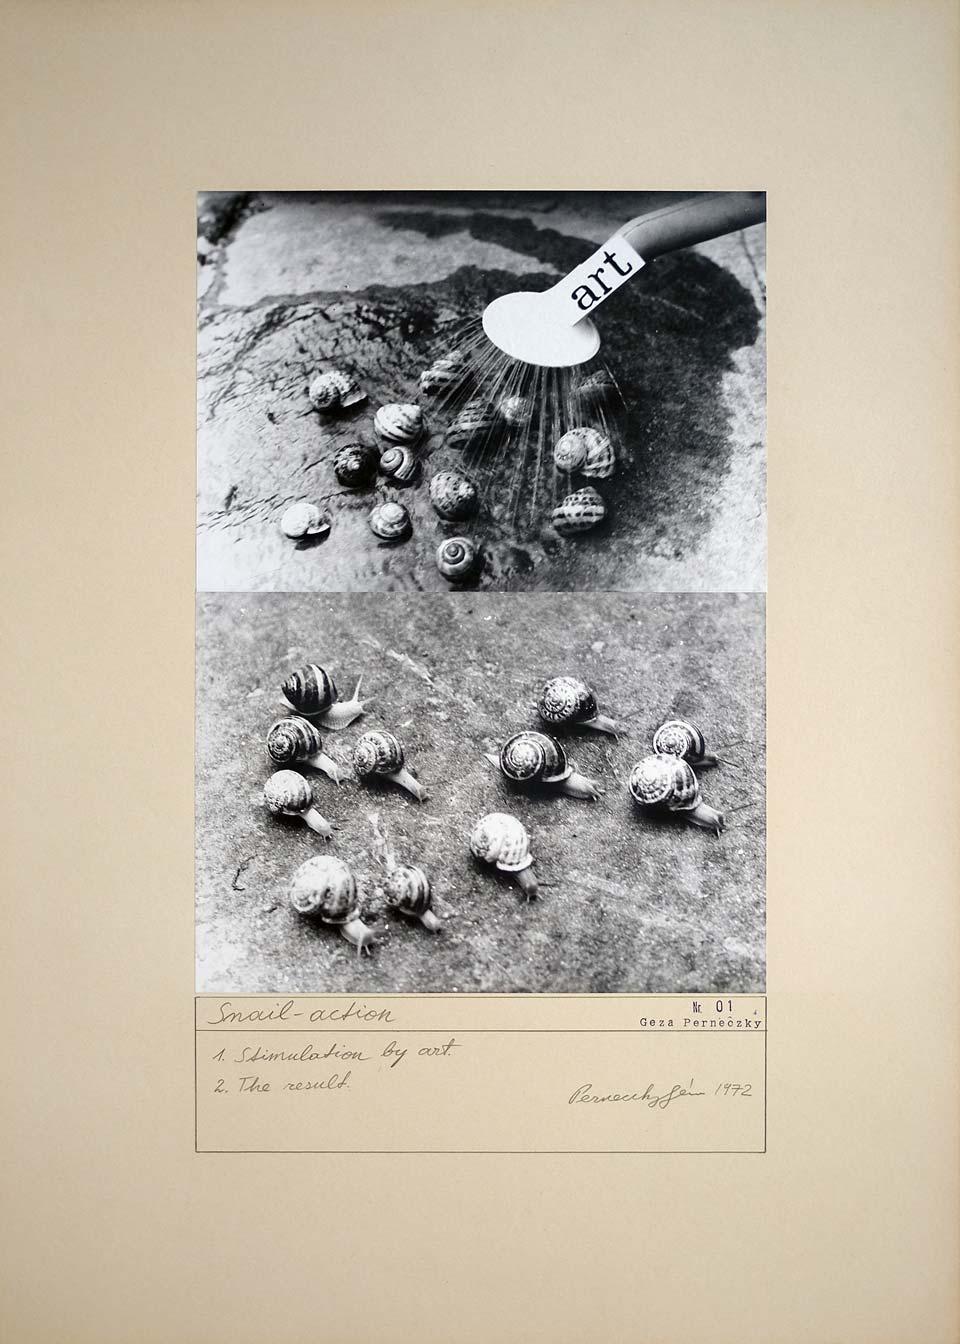 Géza Perneczky Snail Action Metropolitan Museum collection